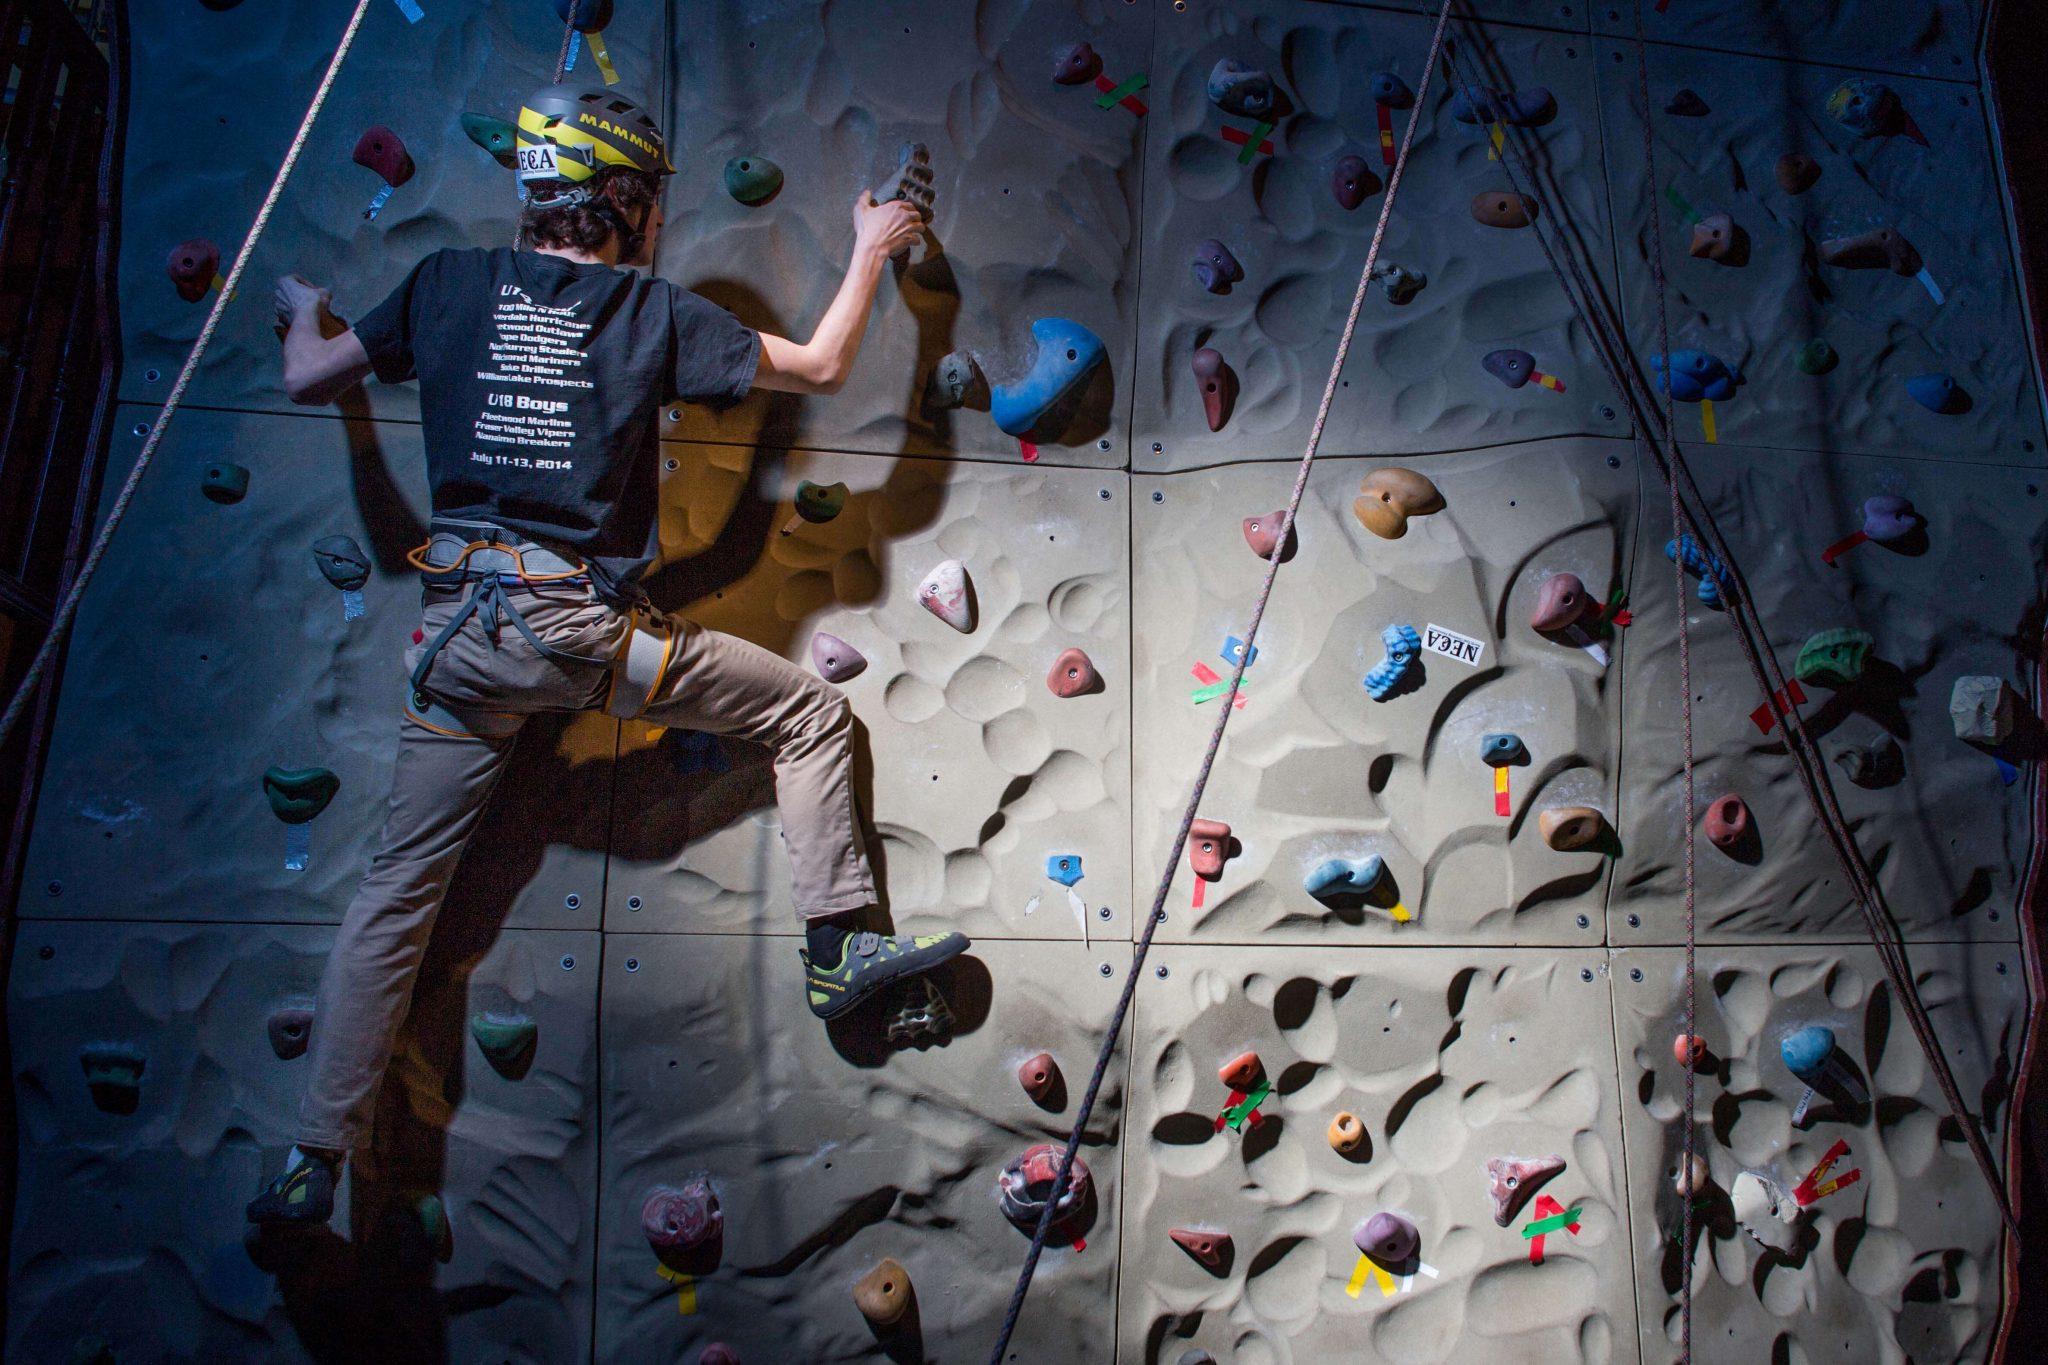 tumbler ridge business opportunities